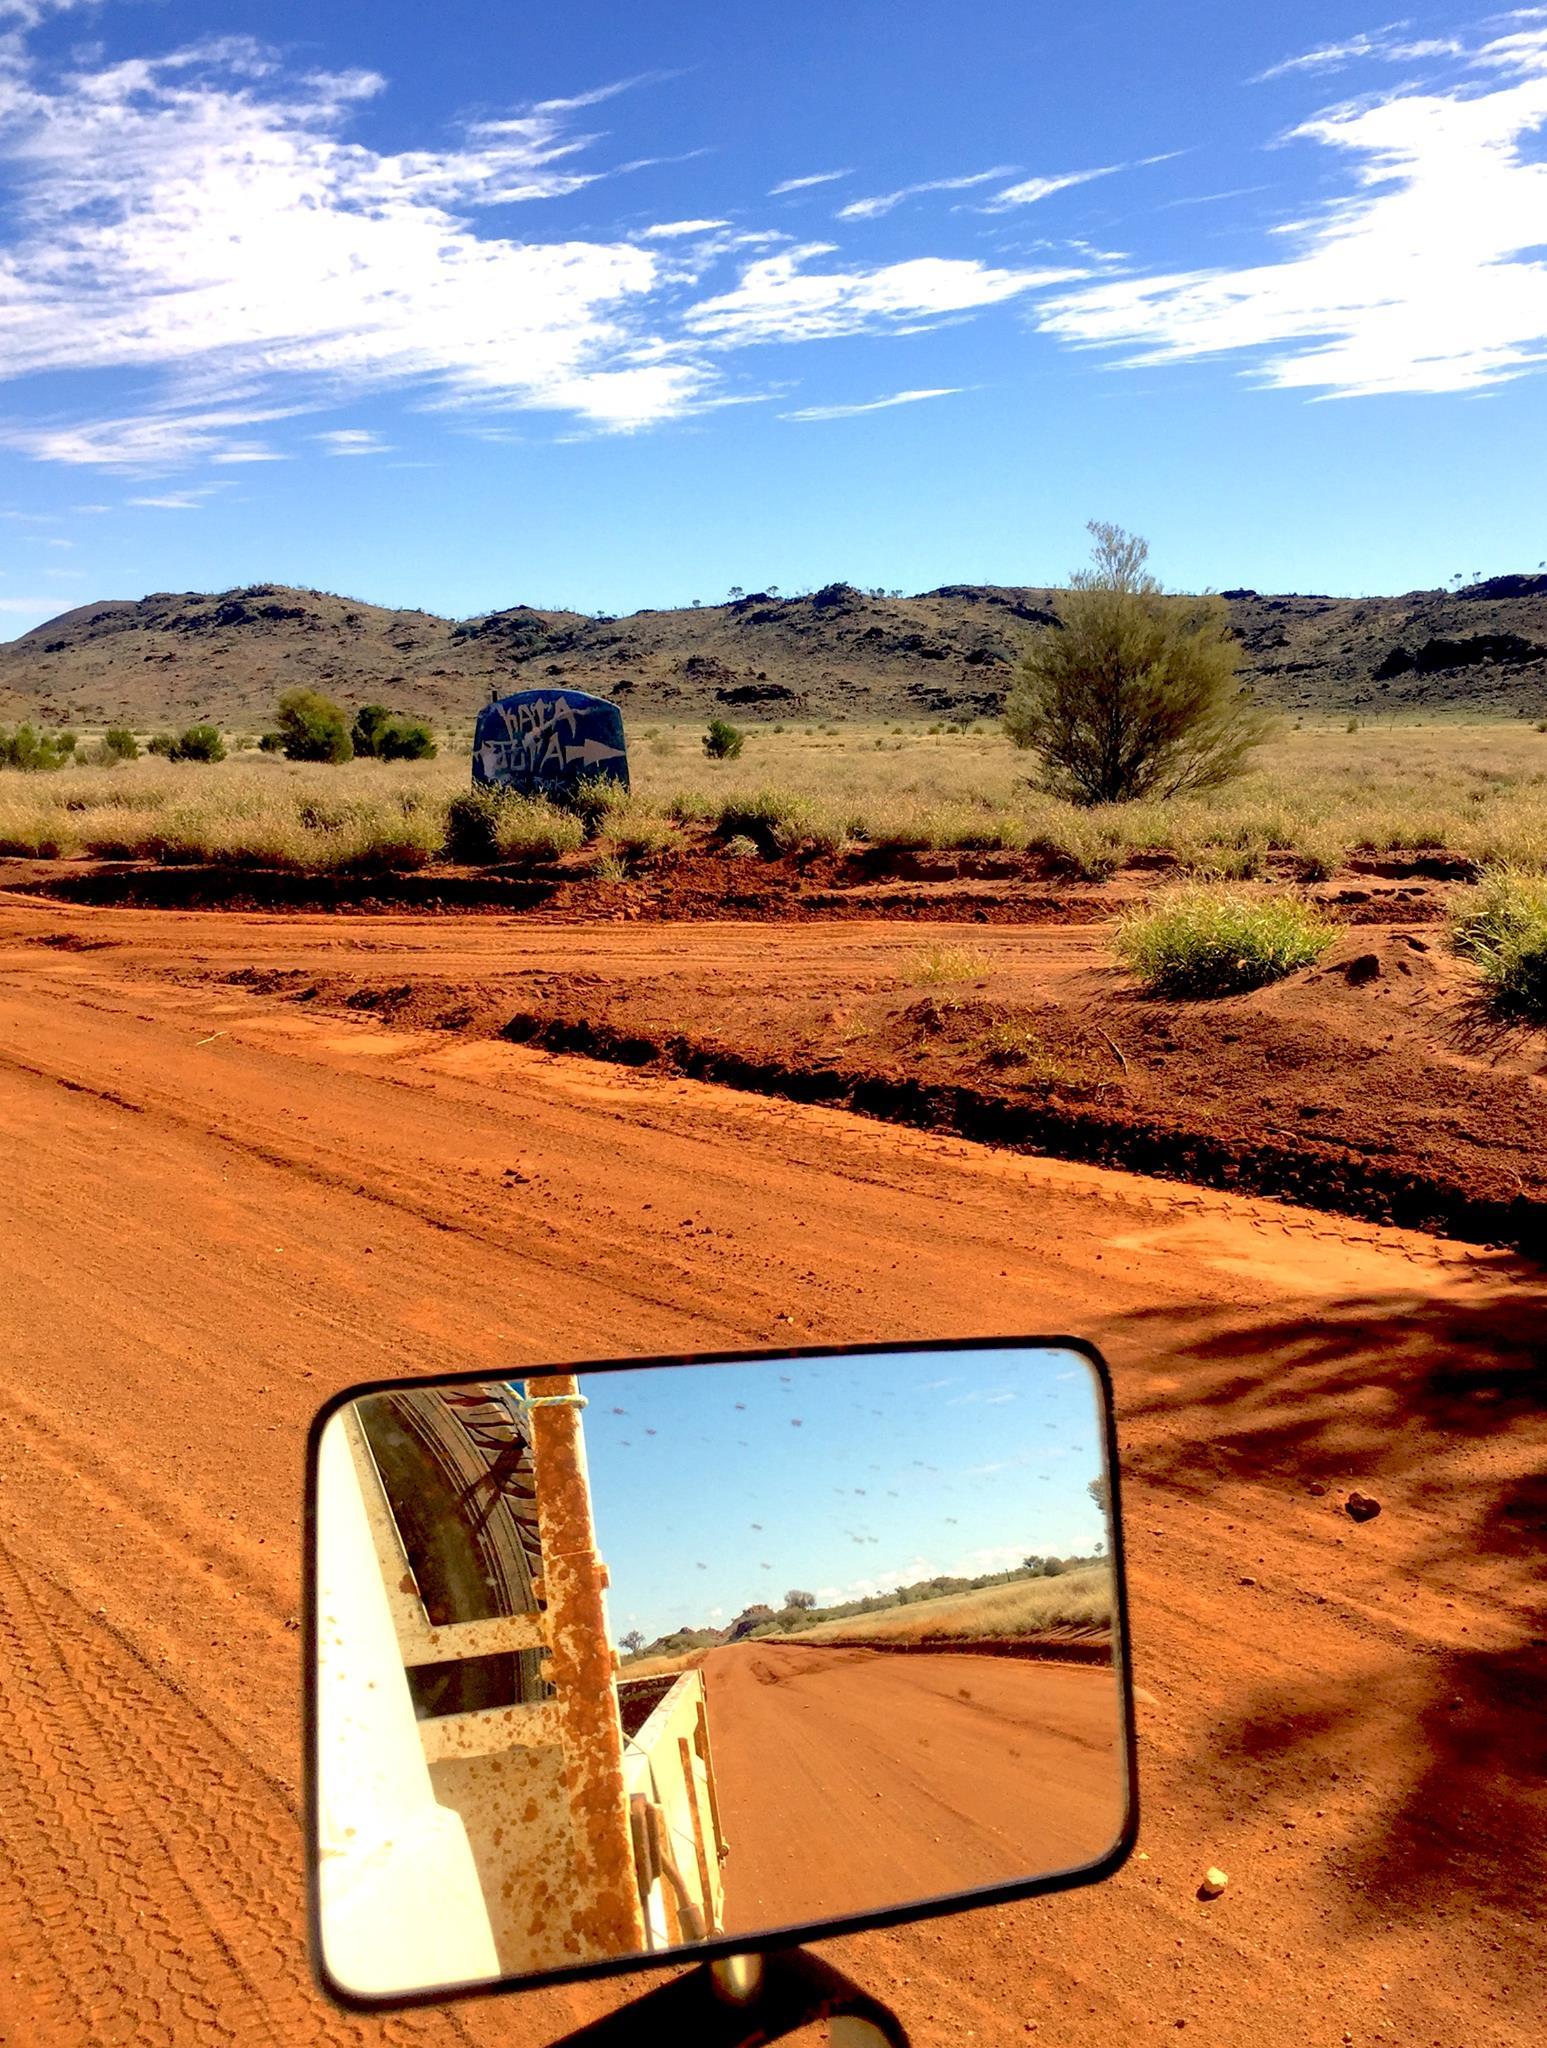 Piste Aborigène vers Uluru : 280 km. © Photo : Aboriginal Signature • Estrangin Fine art gallery